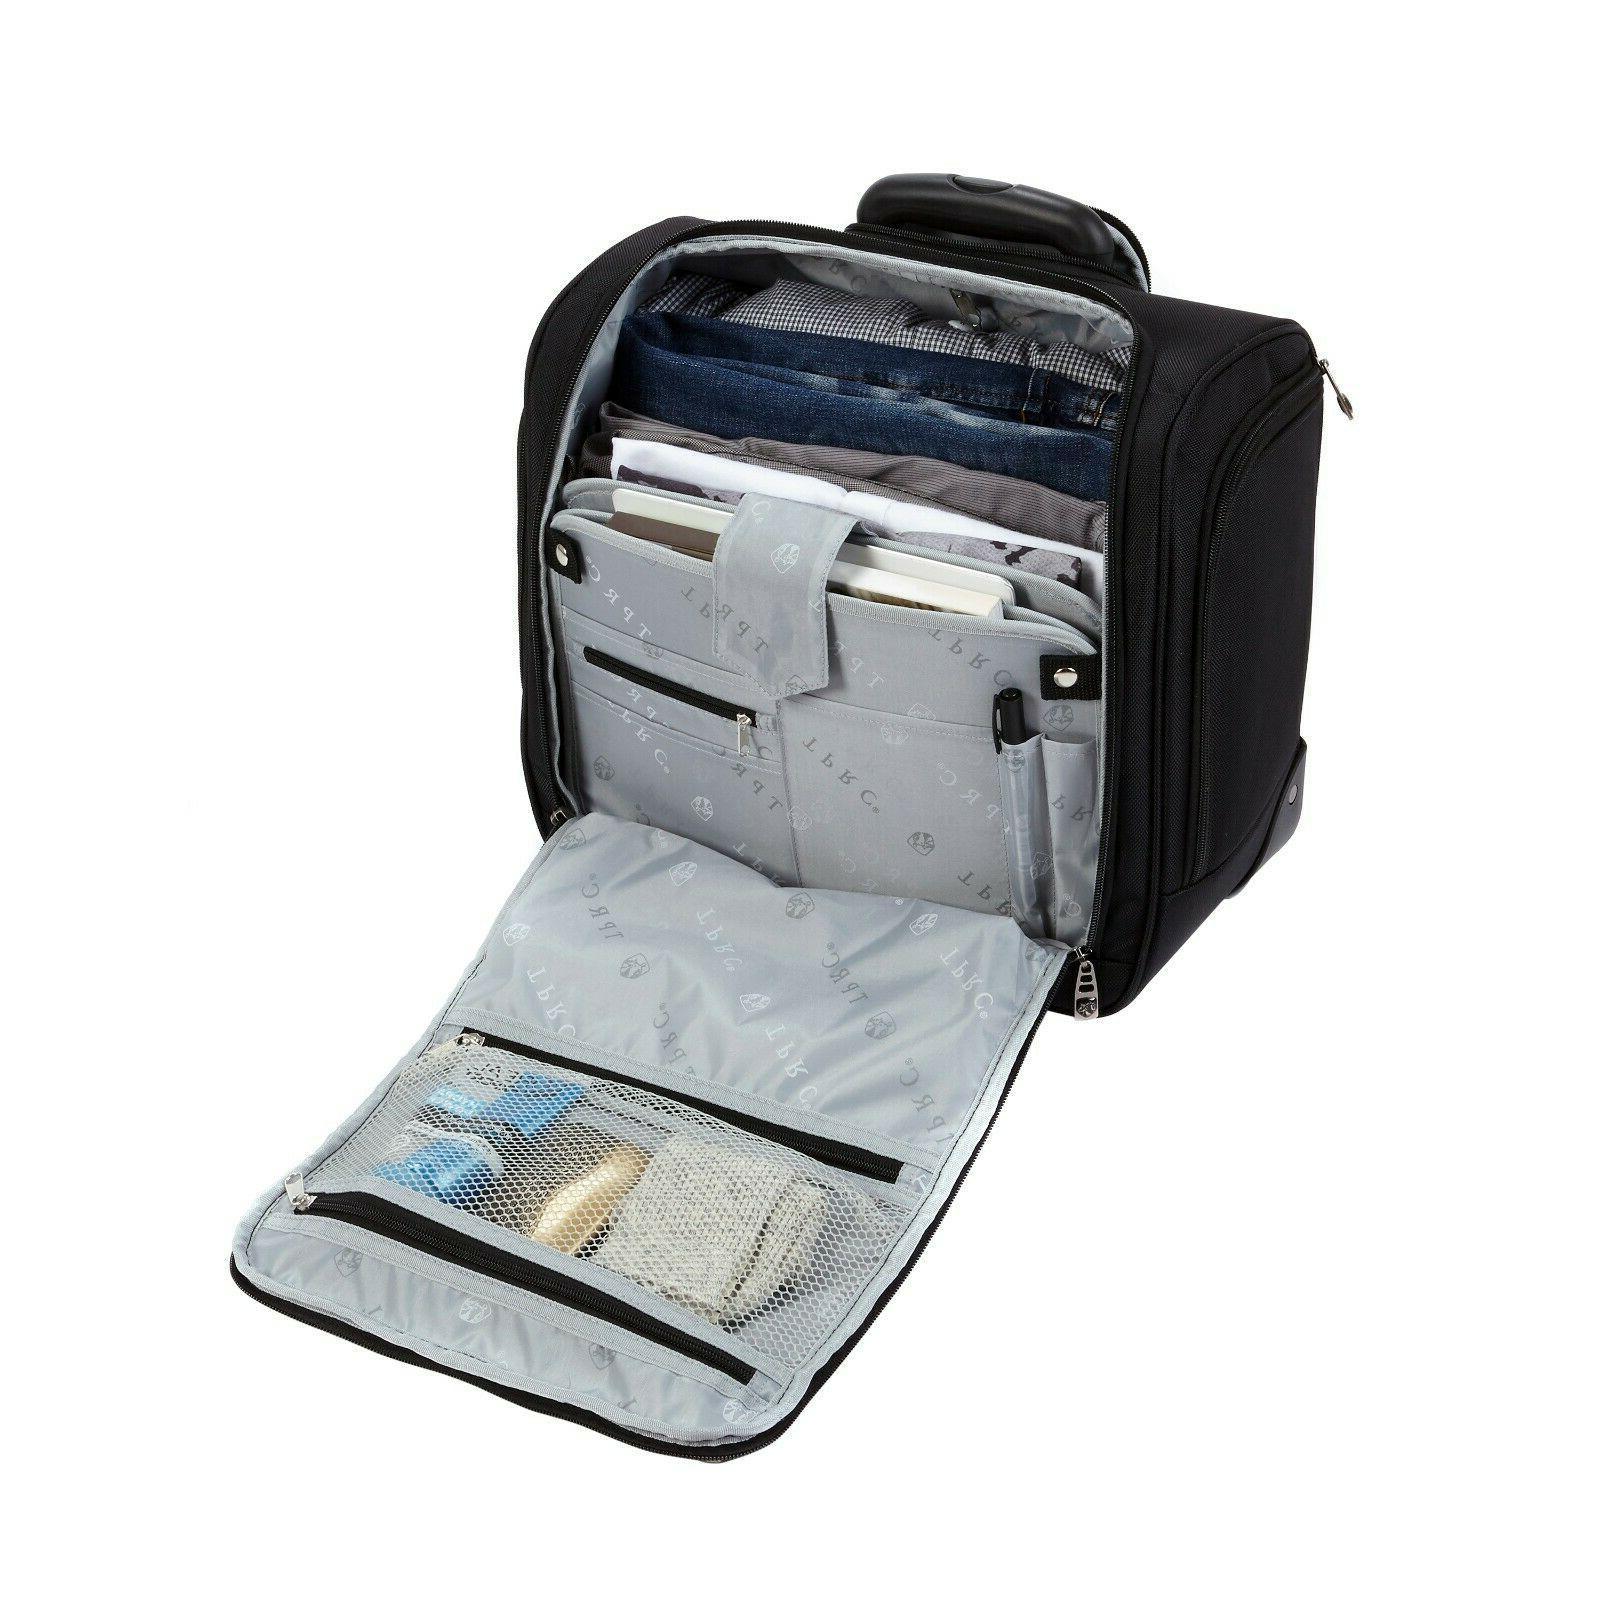 16 Luggage Rolling Wheels Seat Black NEW